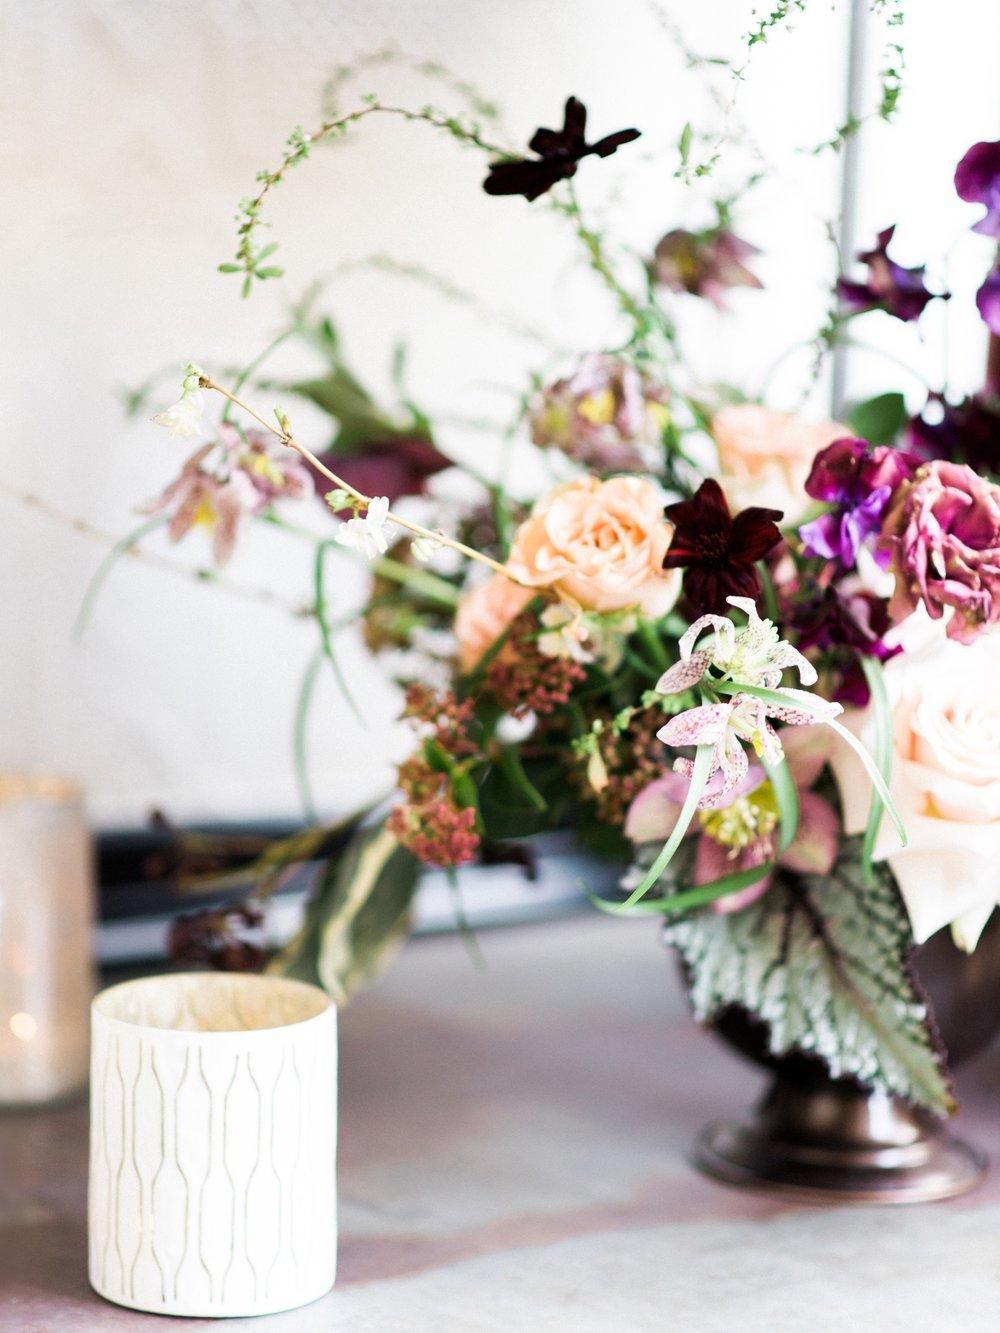 purple wedding flowers with lisianthus and chocolate cosmos.jpg